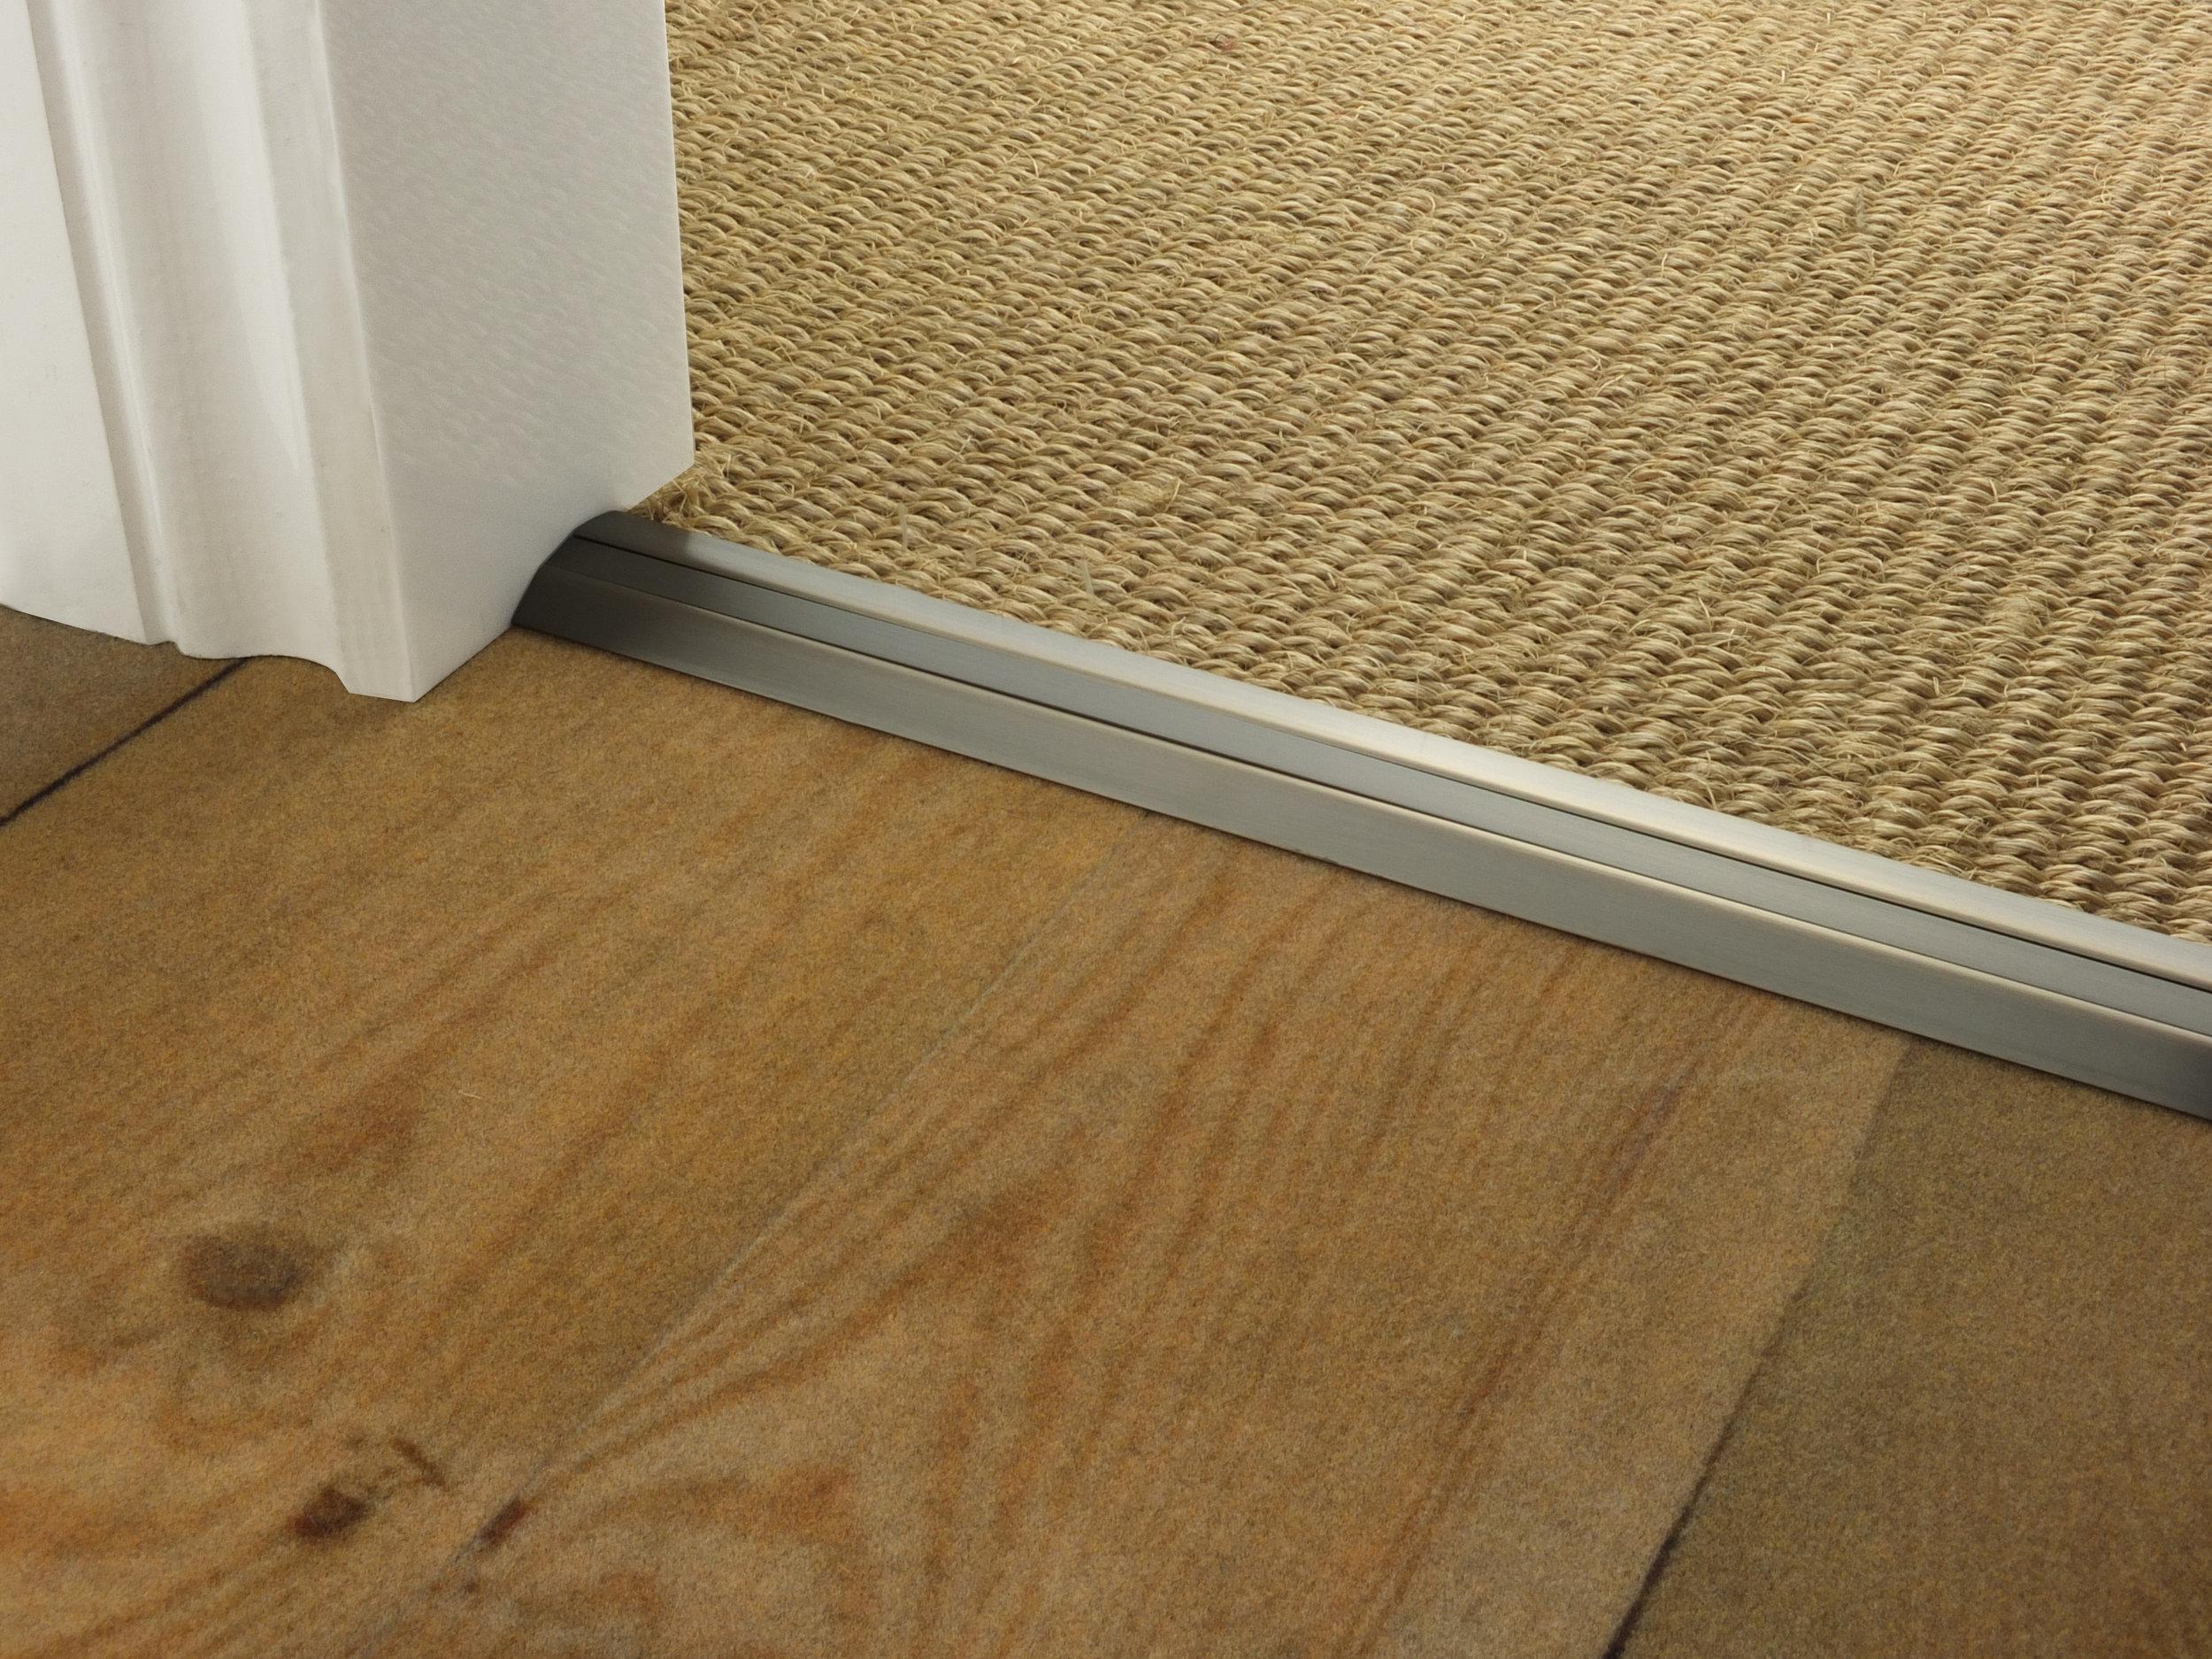 stairrods-doorbar-bronze-posh-30-CTC.jpg